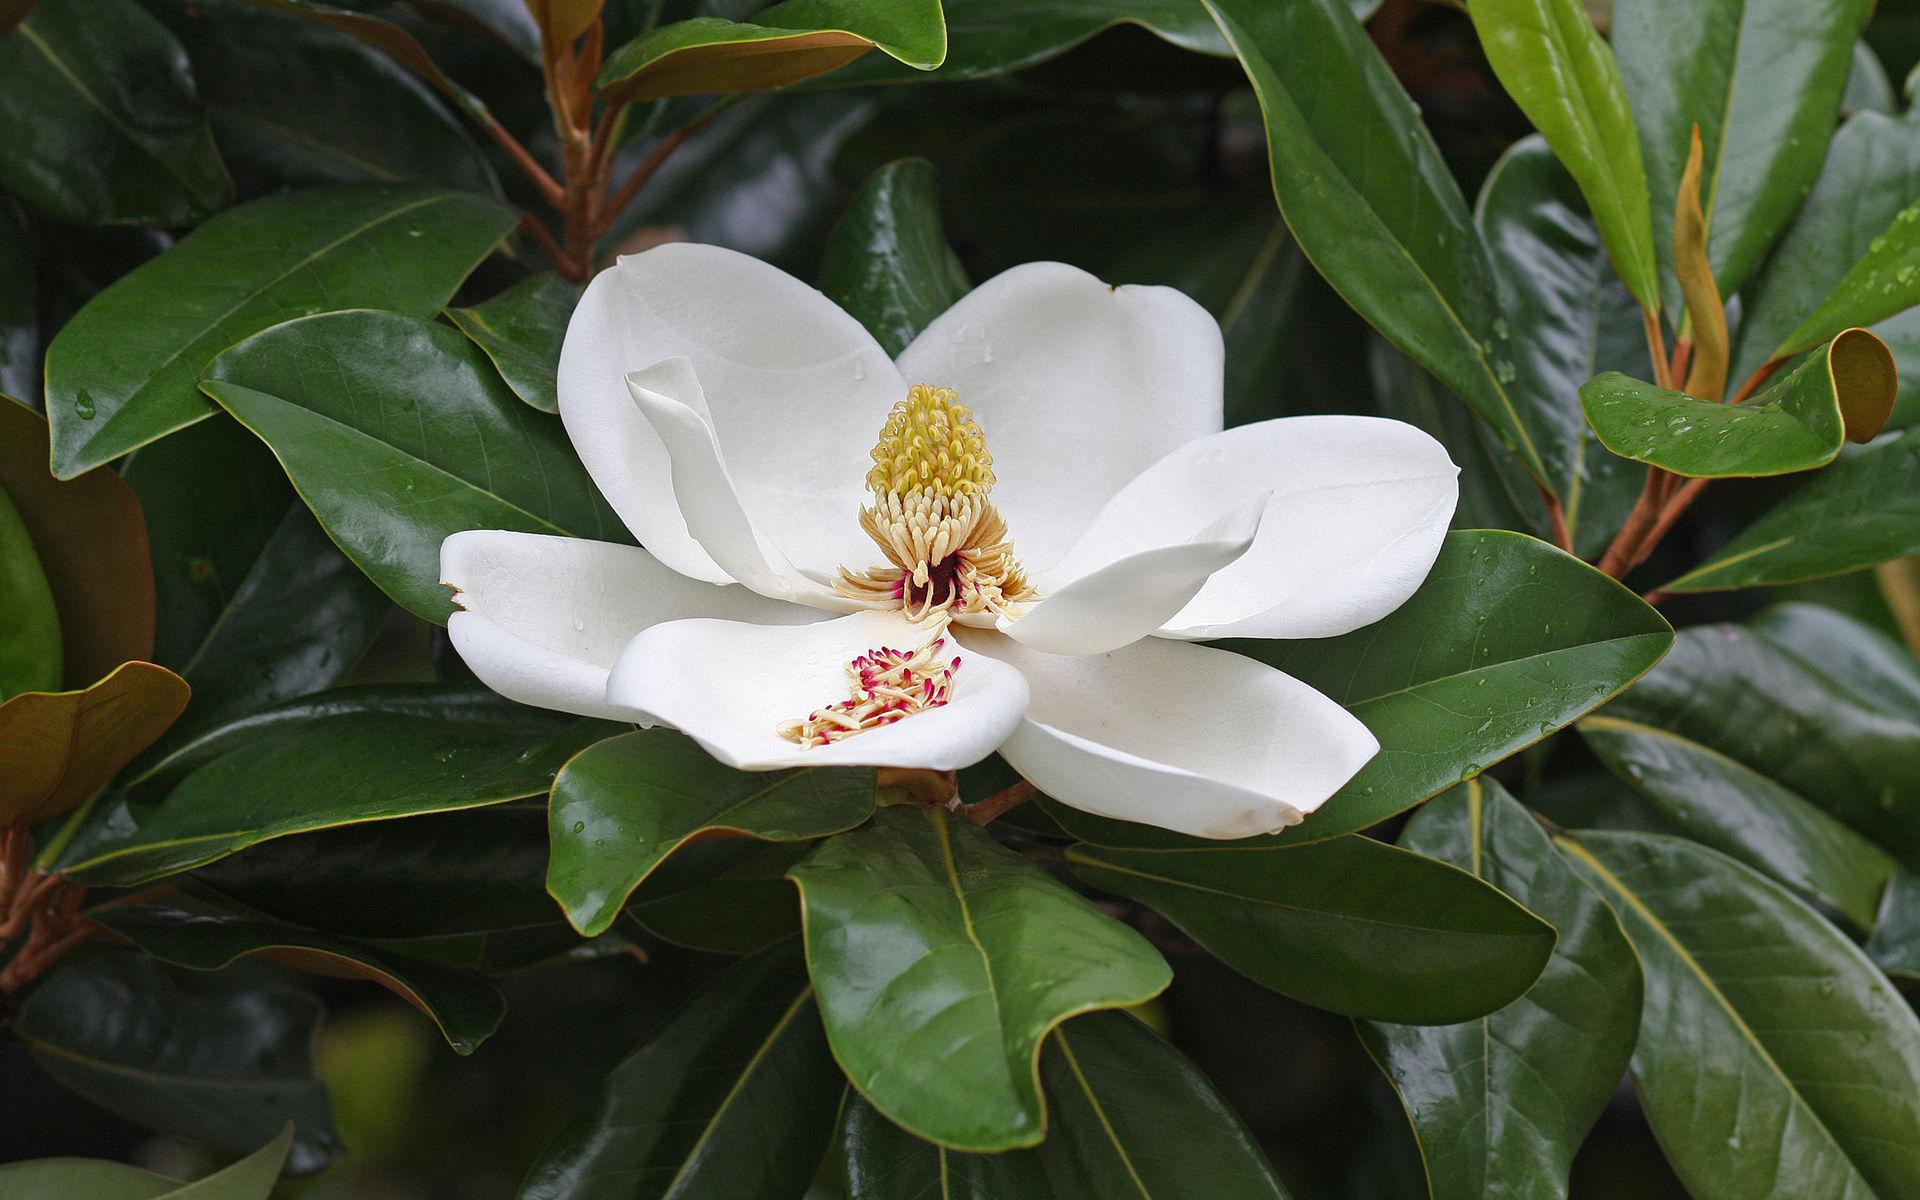 Southern Magnolia Bull Bay Evergreen Magnolia Tennessee Smart